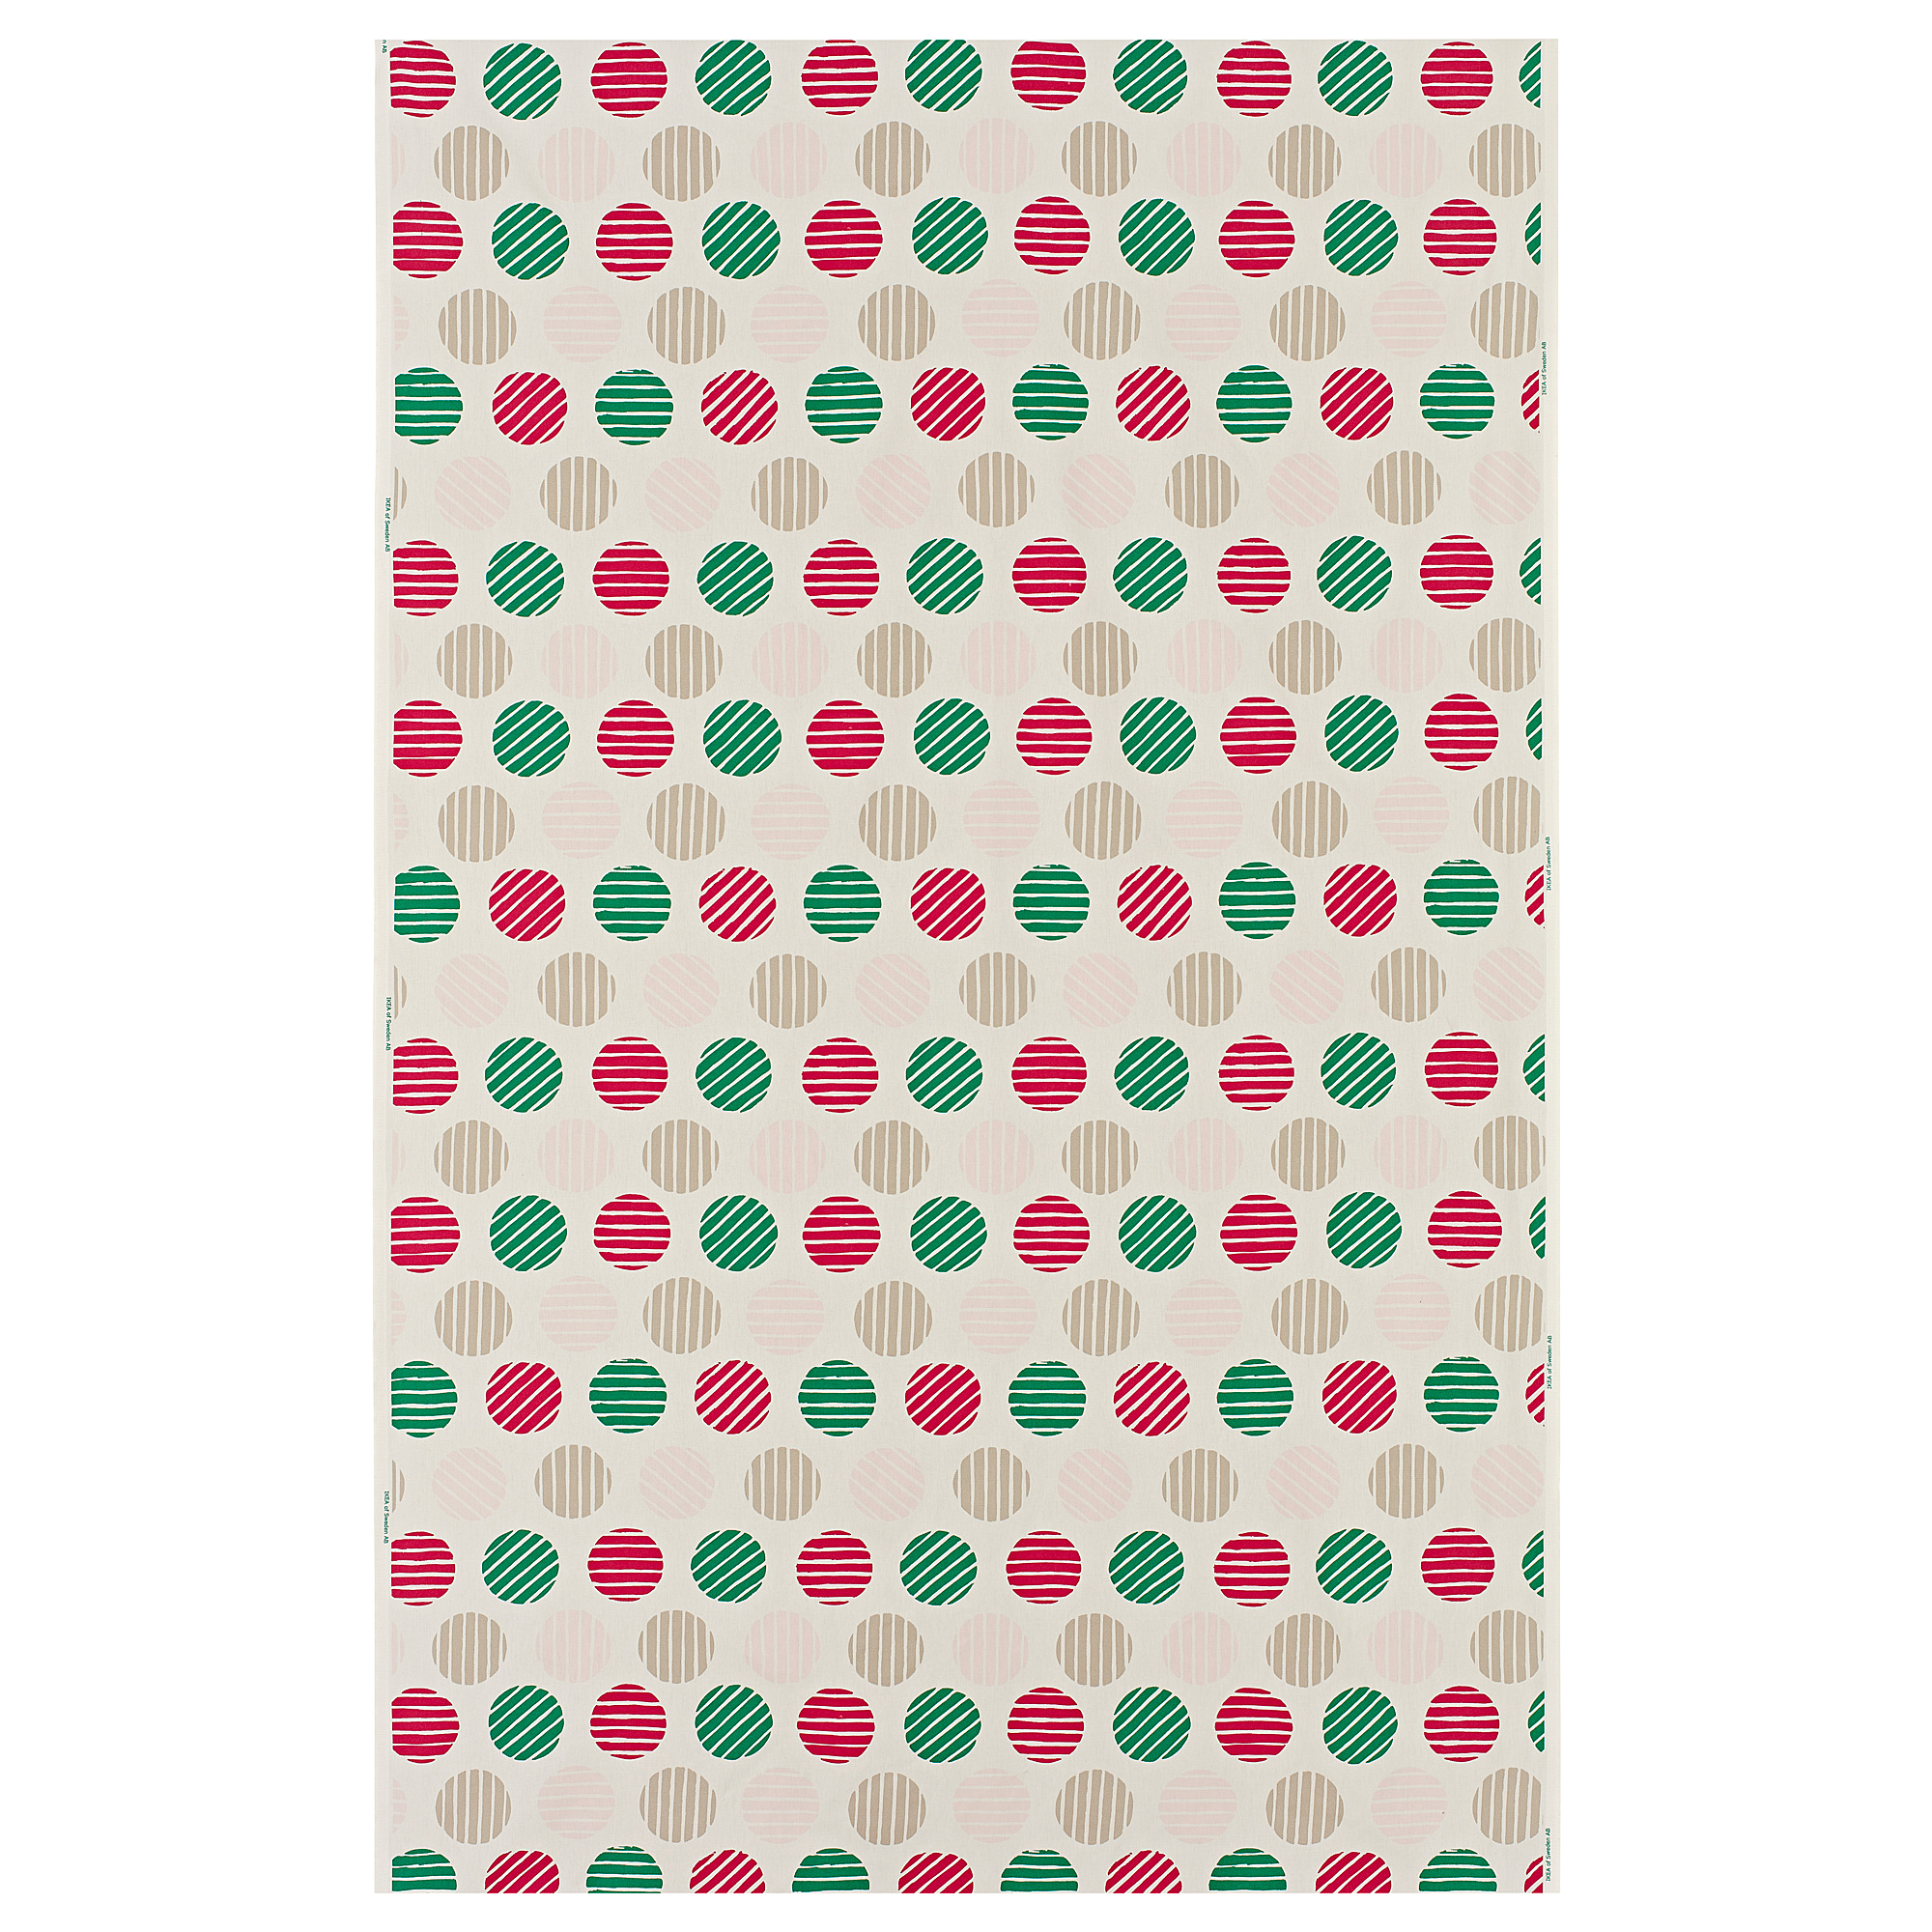 Ткань ЯННЕККЕ розовый артикуль № 804.217.23 в наличии. Онлайн каталог IKEA РБ. Недорогая доставка и монтаж.